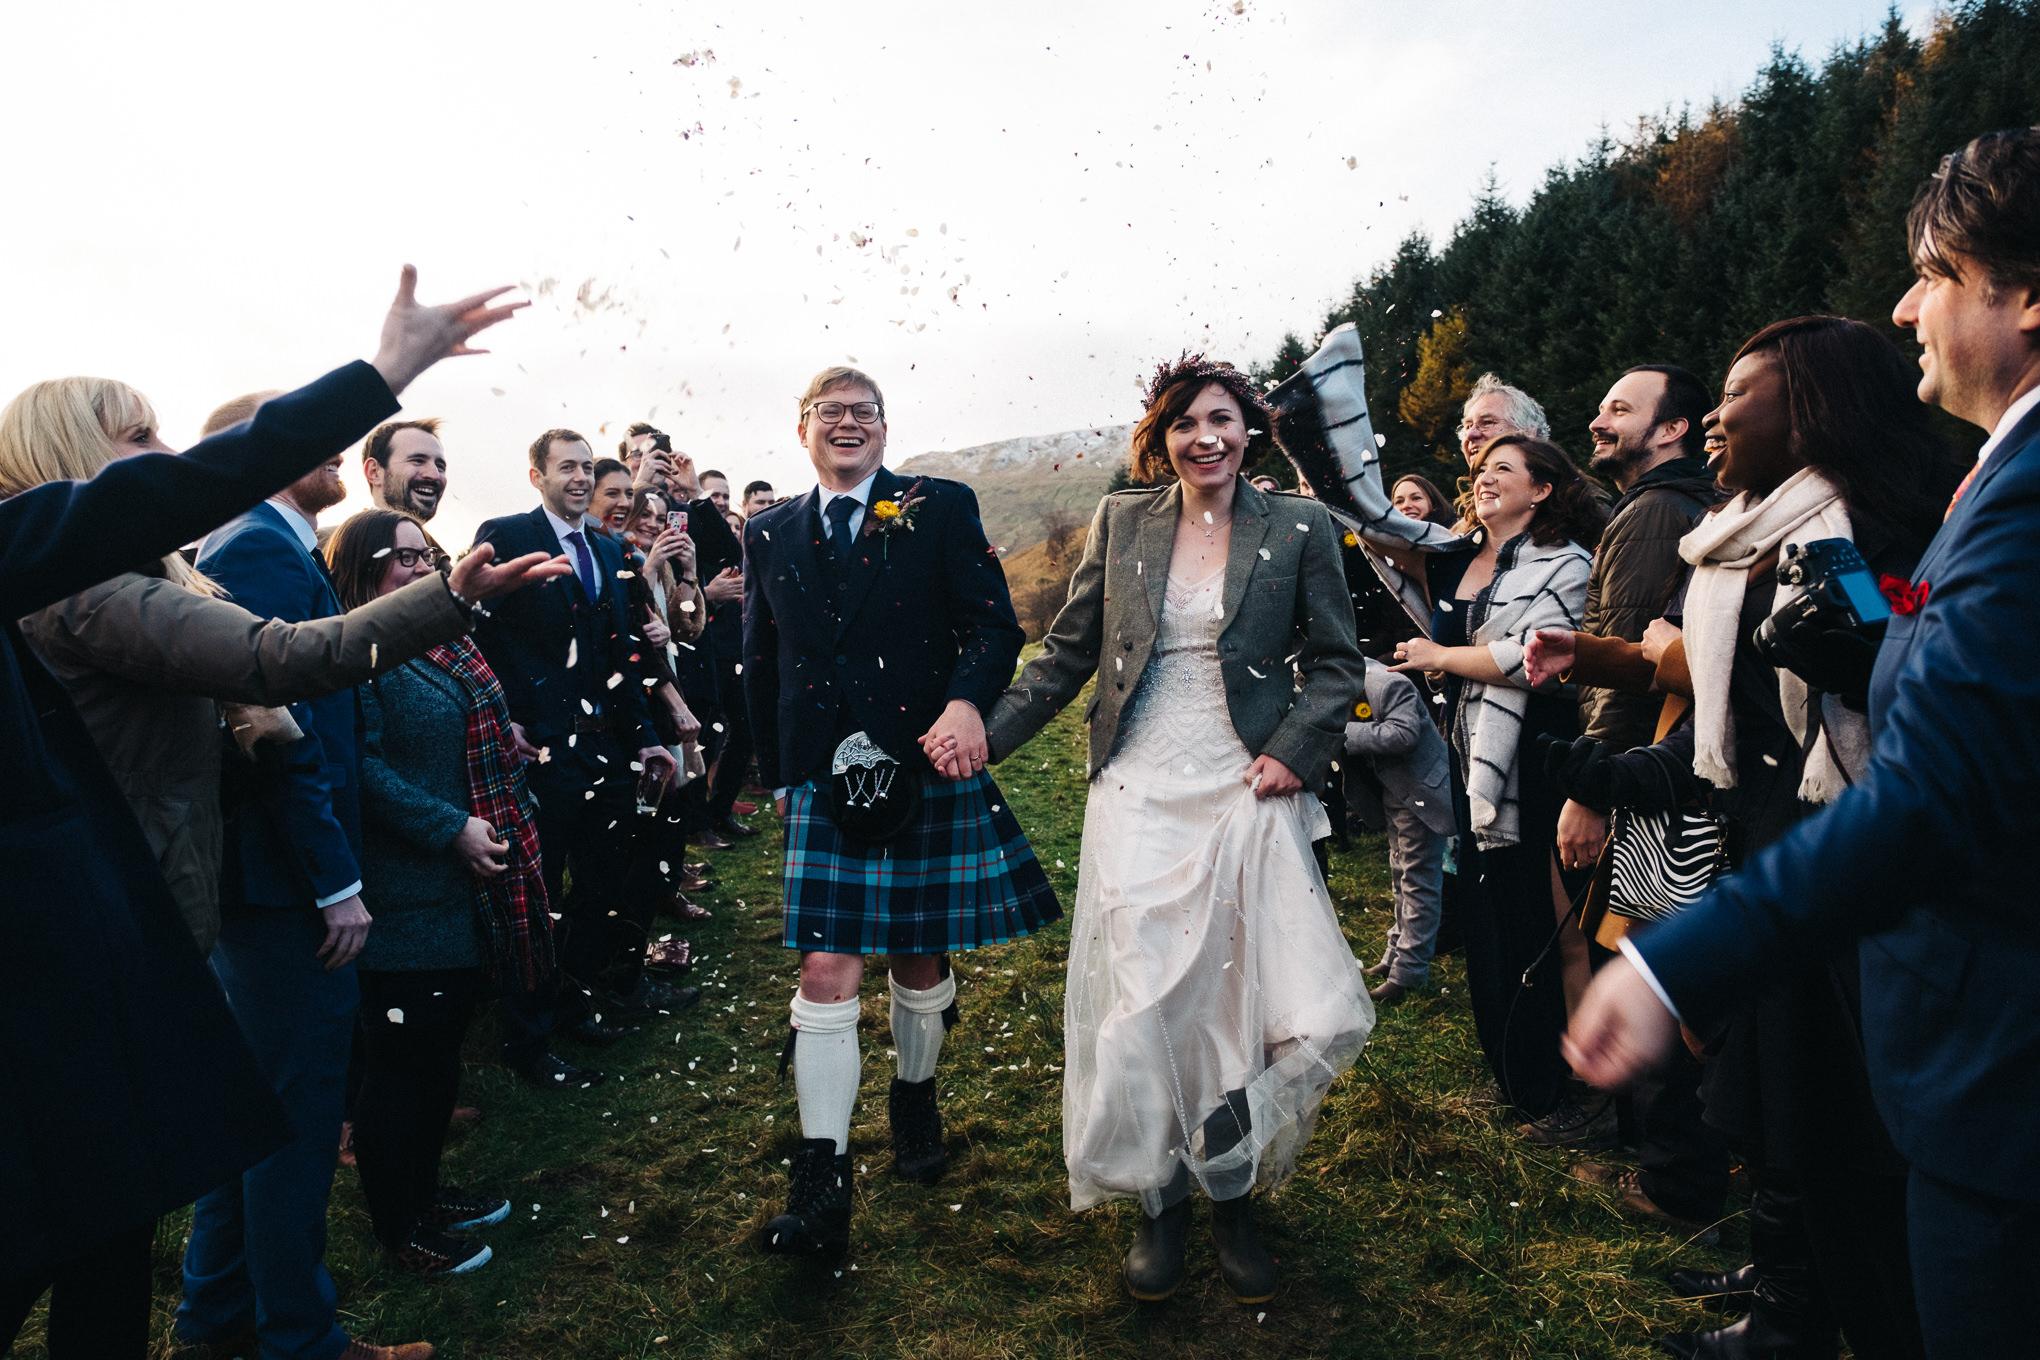 20171111_Monachyle Mhor Wedding_006.jpg